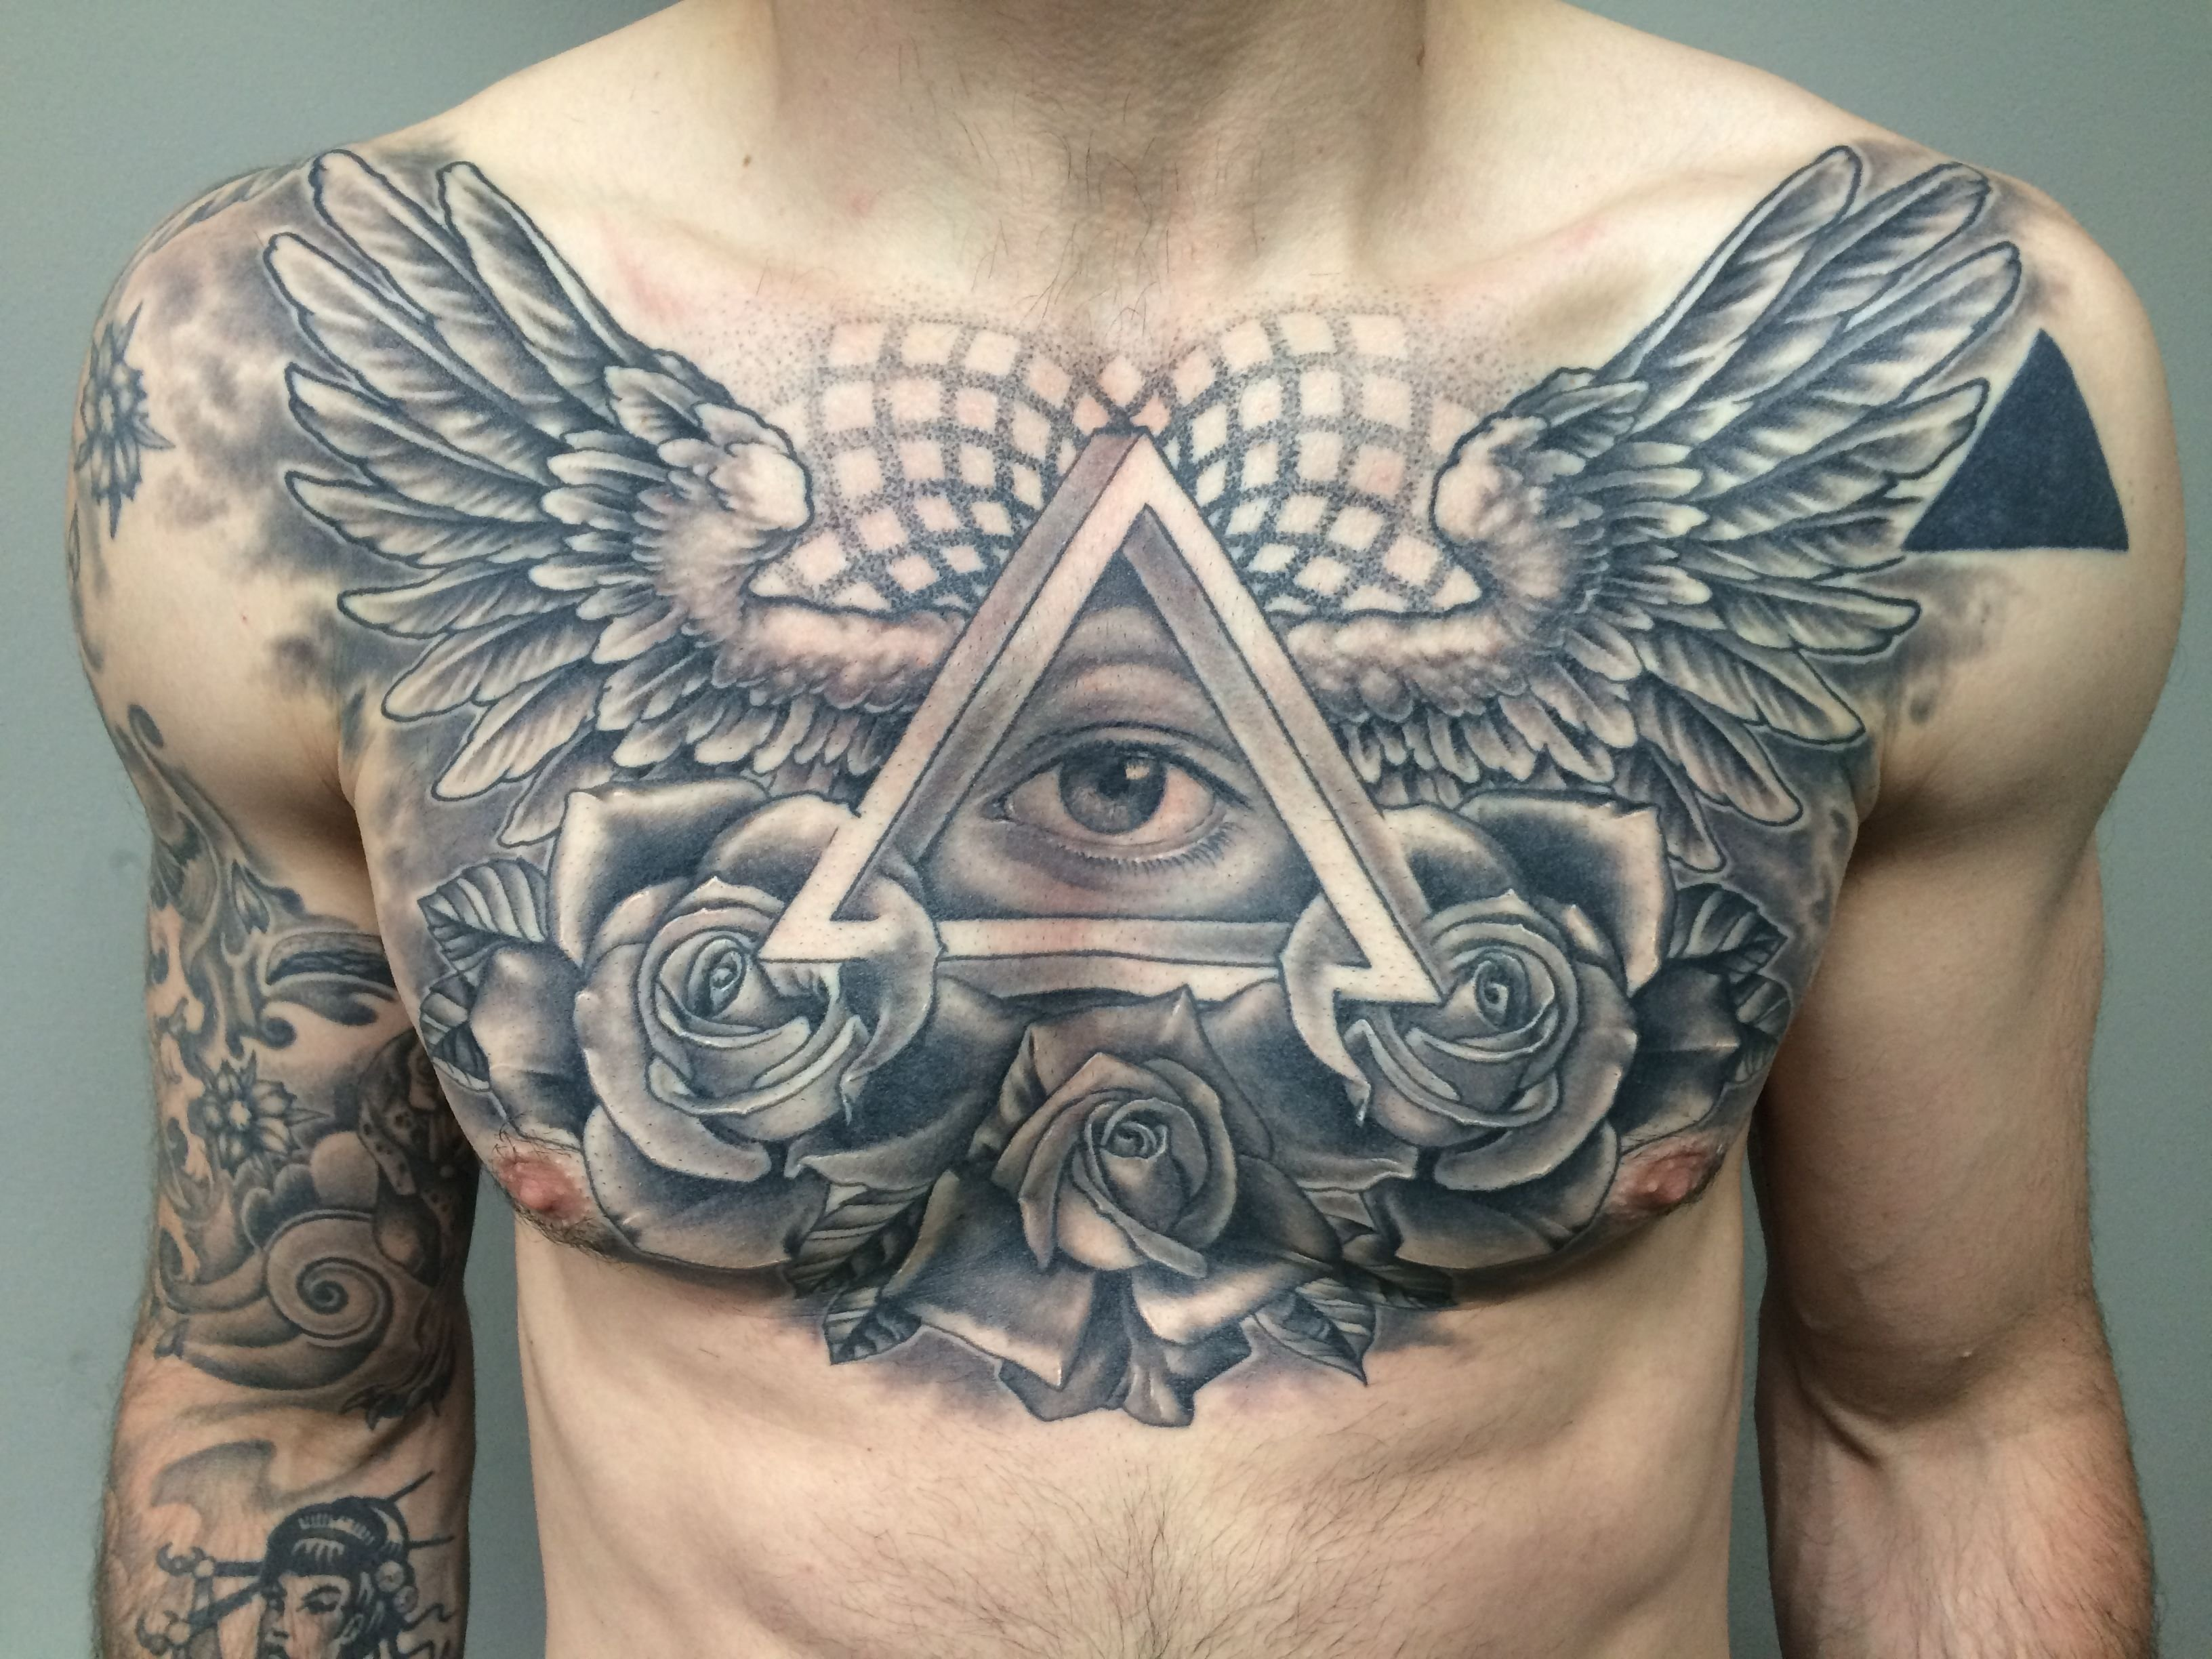 wings chest piece tattoo | tattoos | pinterest | chest piece tattoos